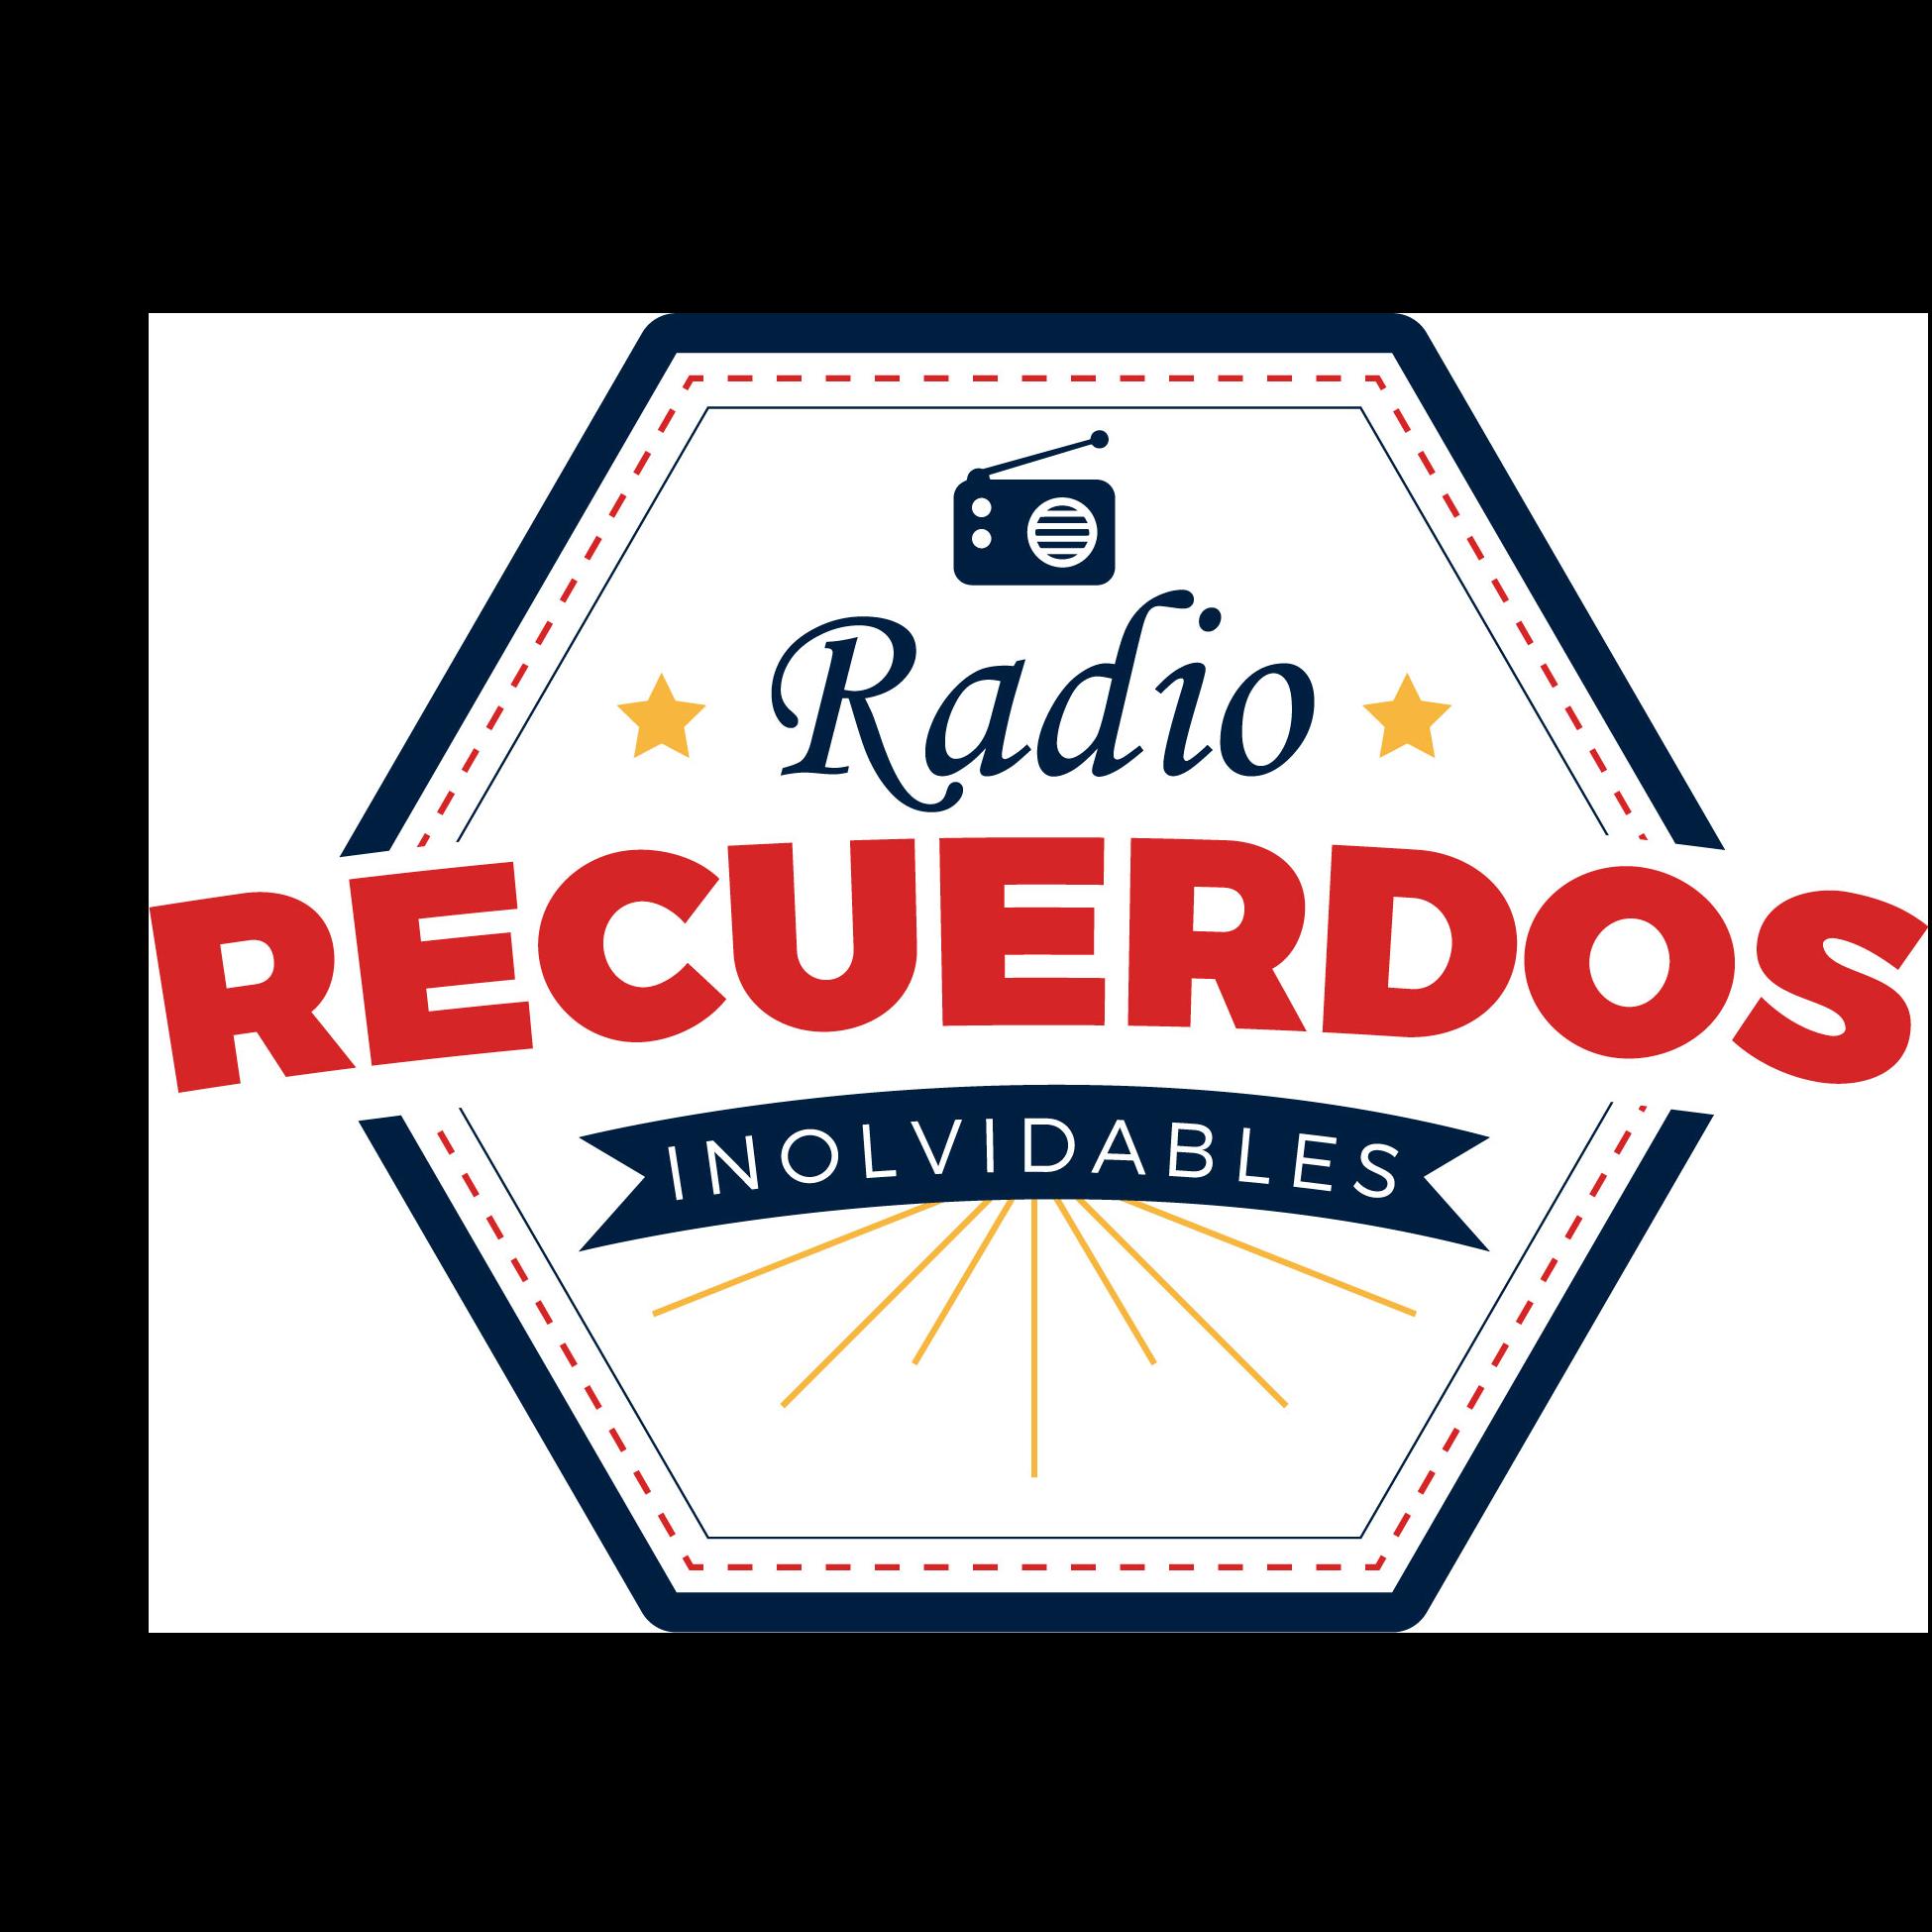 Radio Recuerdos Inolvidables Atlanta